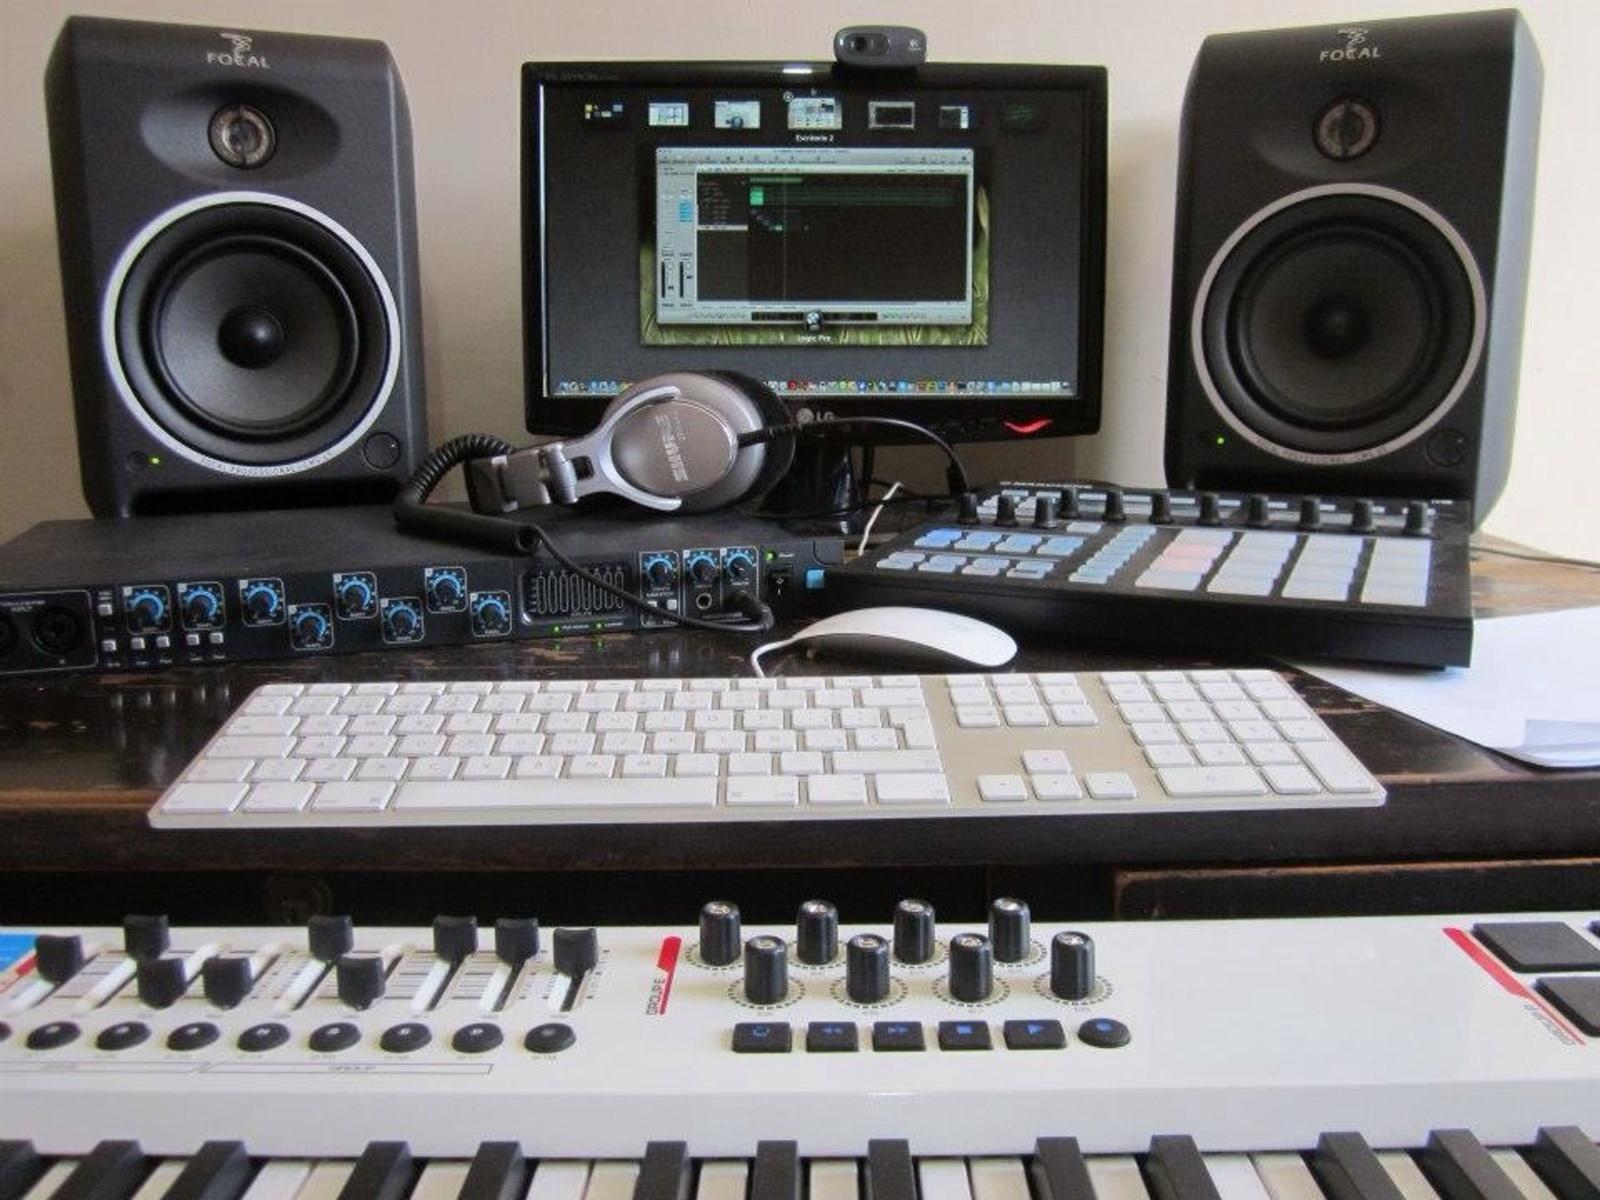 Photo of M-Audio Axiom Pro 61 Advanced 61 Key USB MIDI Controller and more gear in a studio